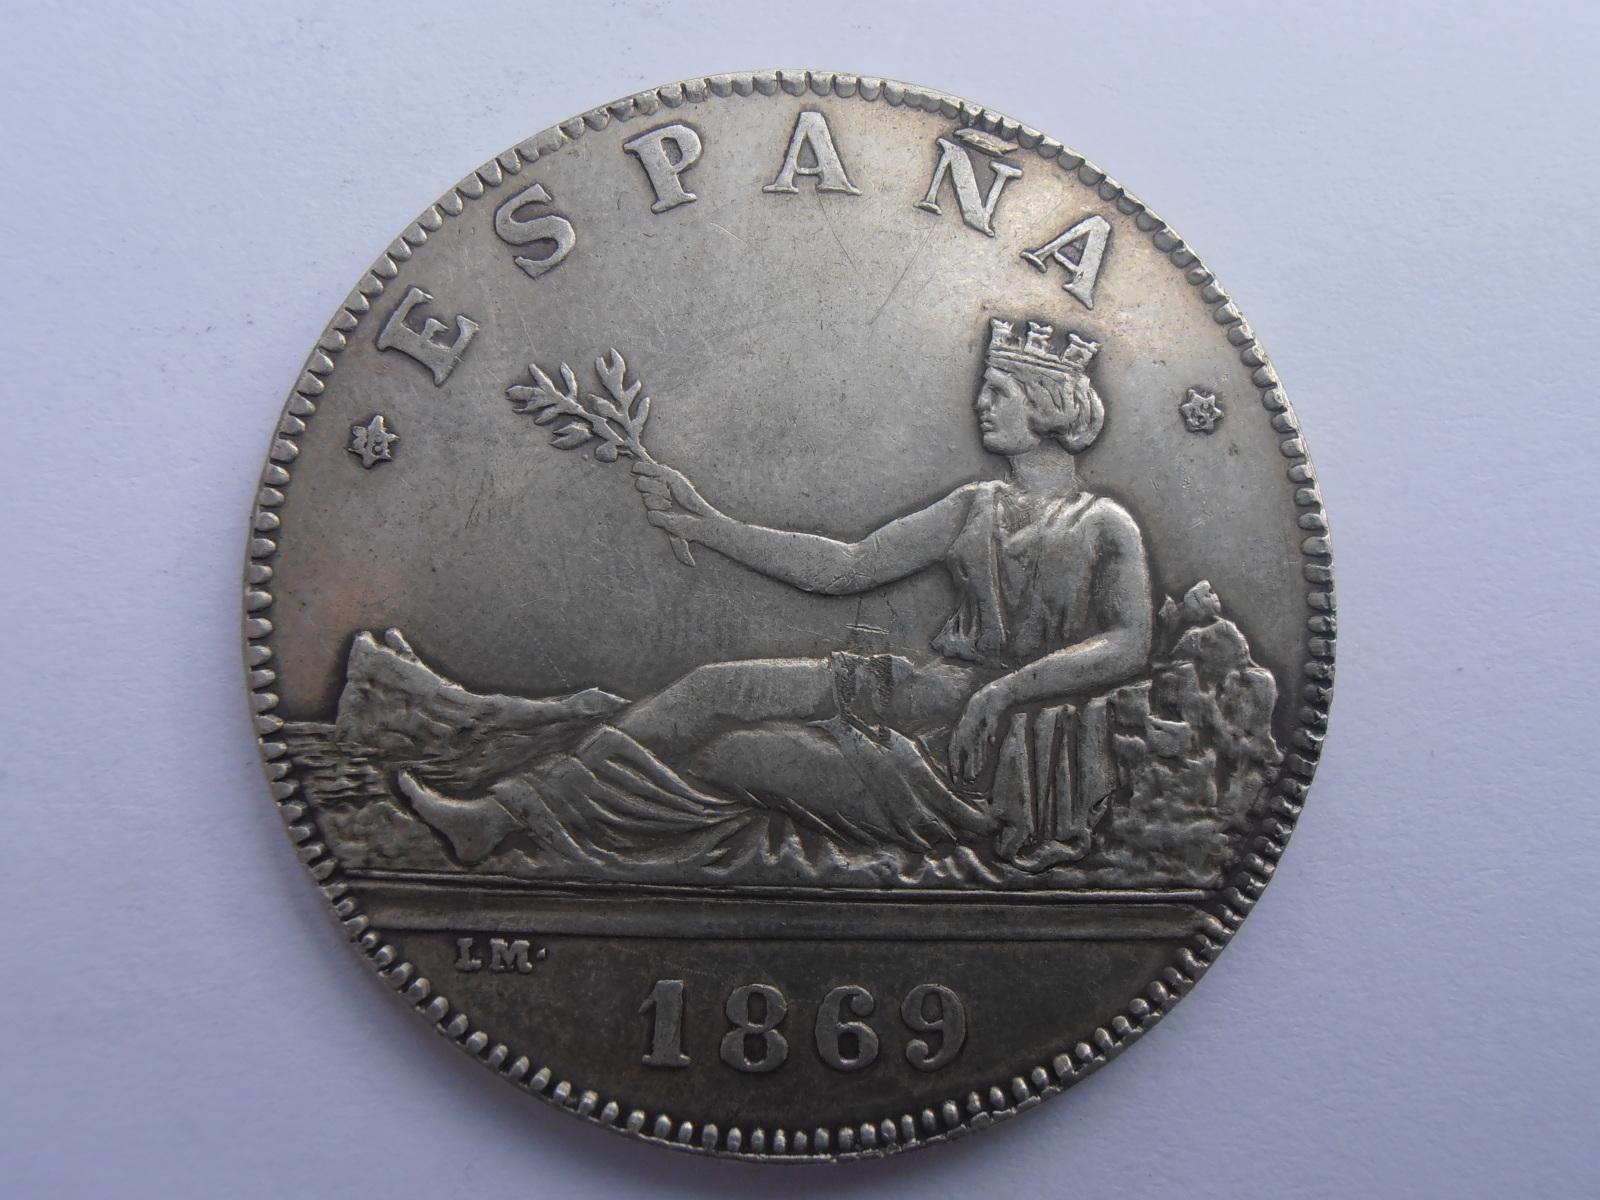 5 Pesetas 1869 Gobierno provisional 2vv84yw